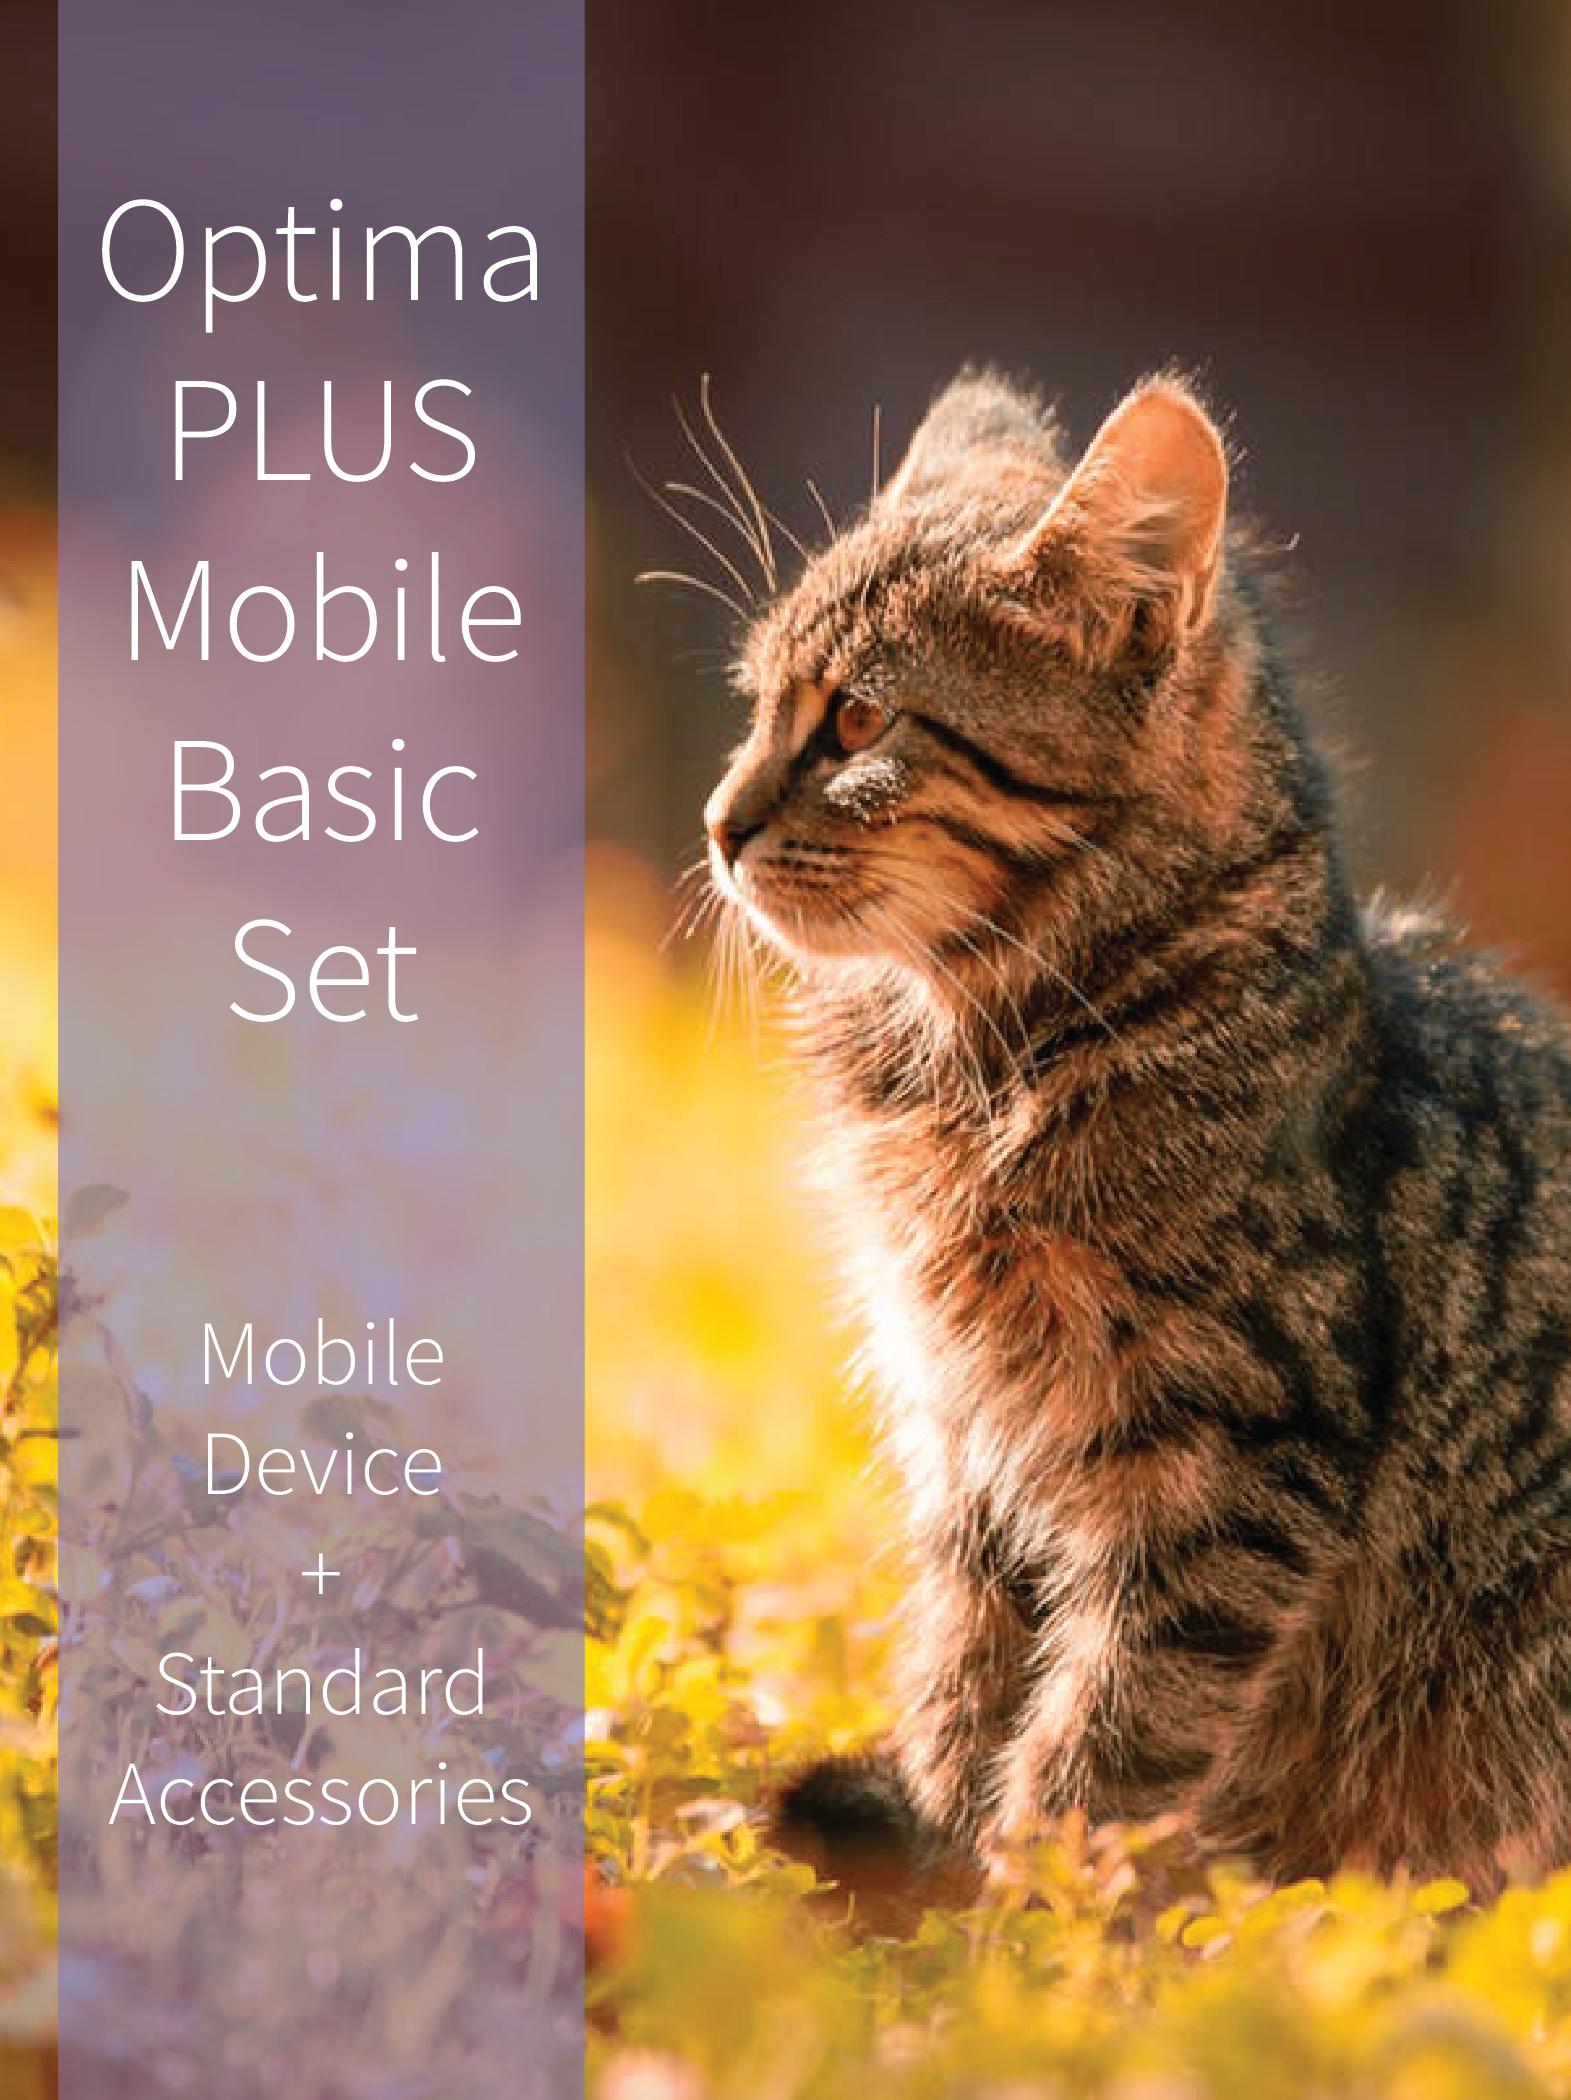 Bicom Optima PLUS Mobile basic set for Bicom therapy.